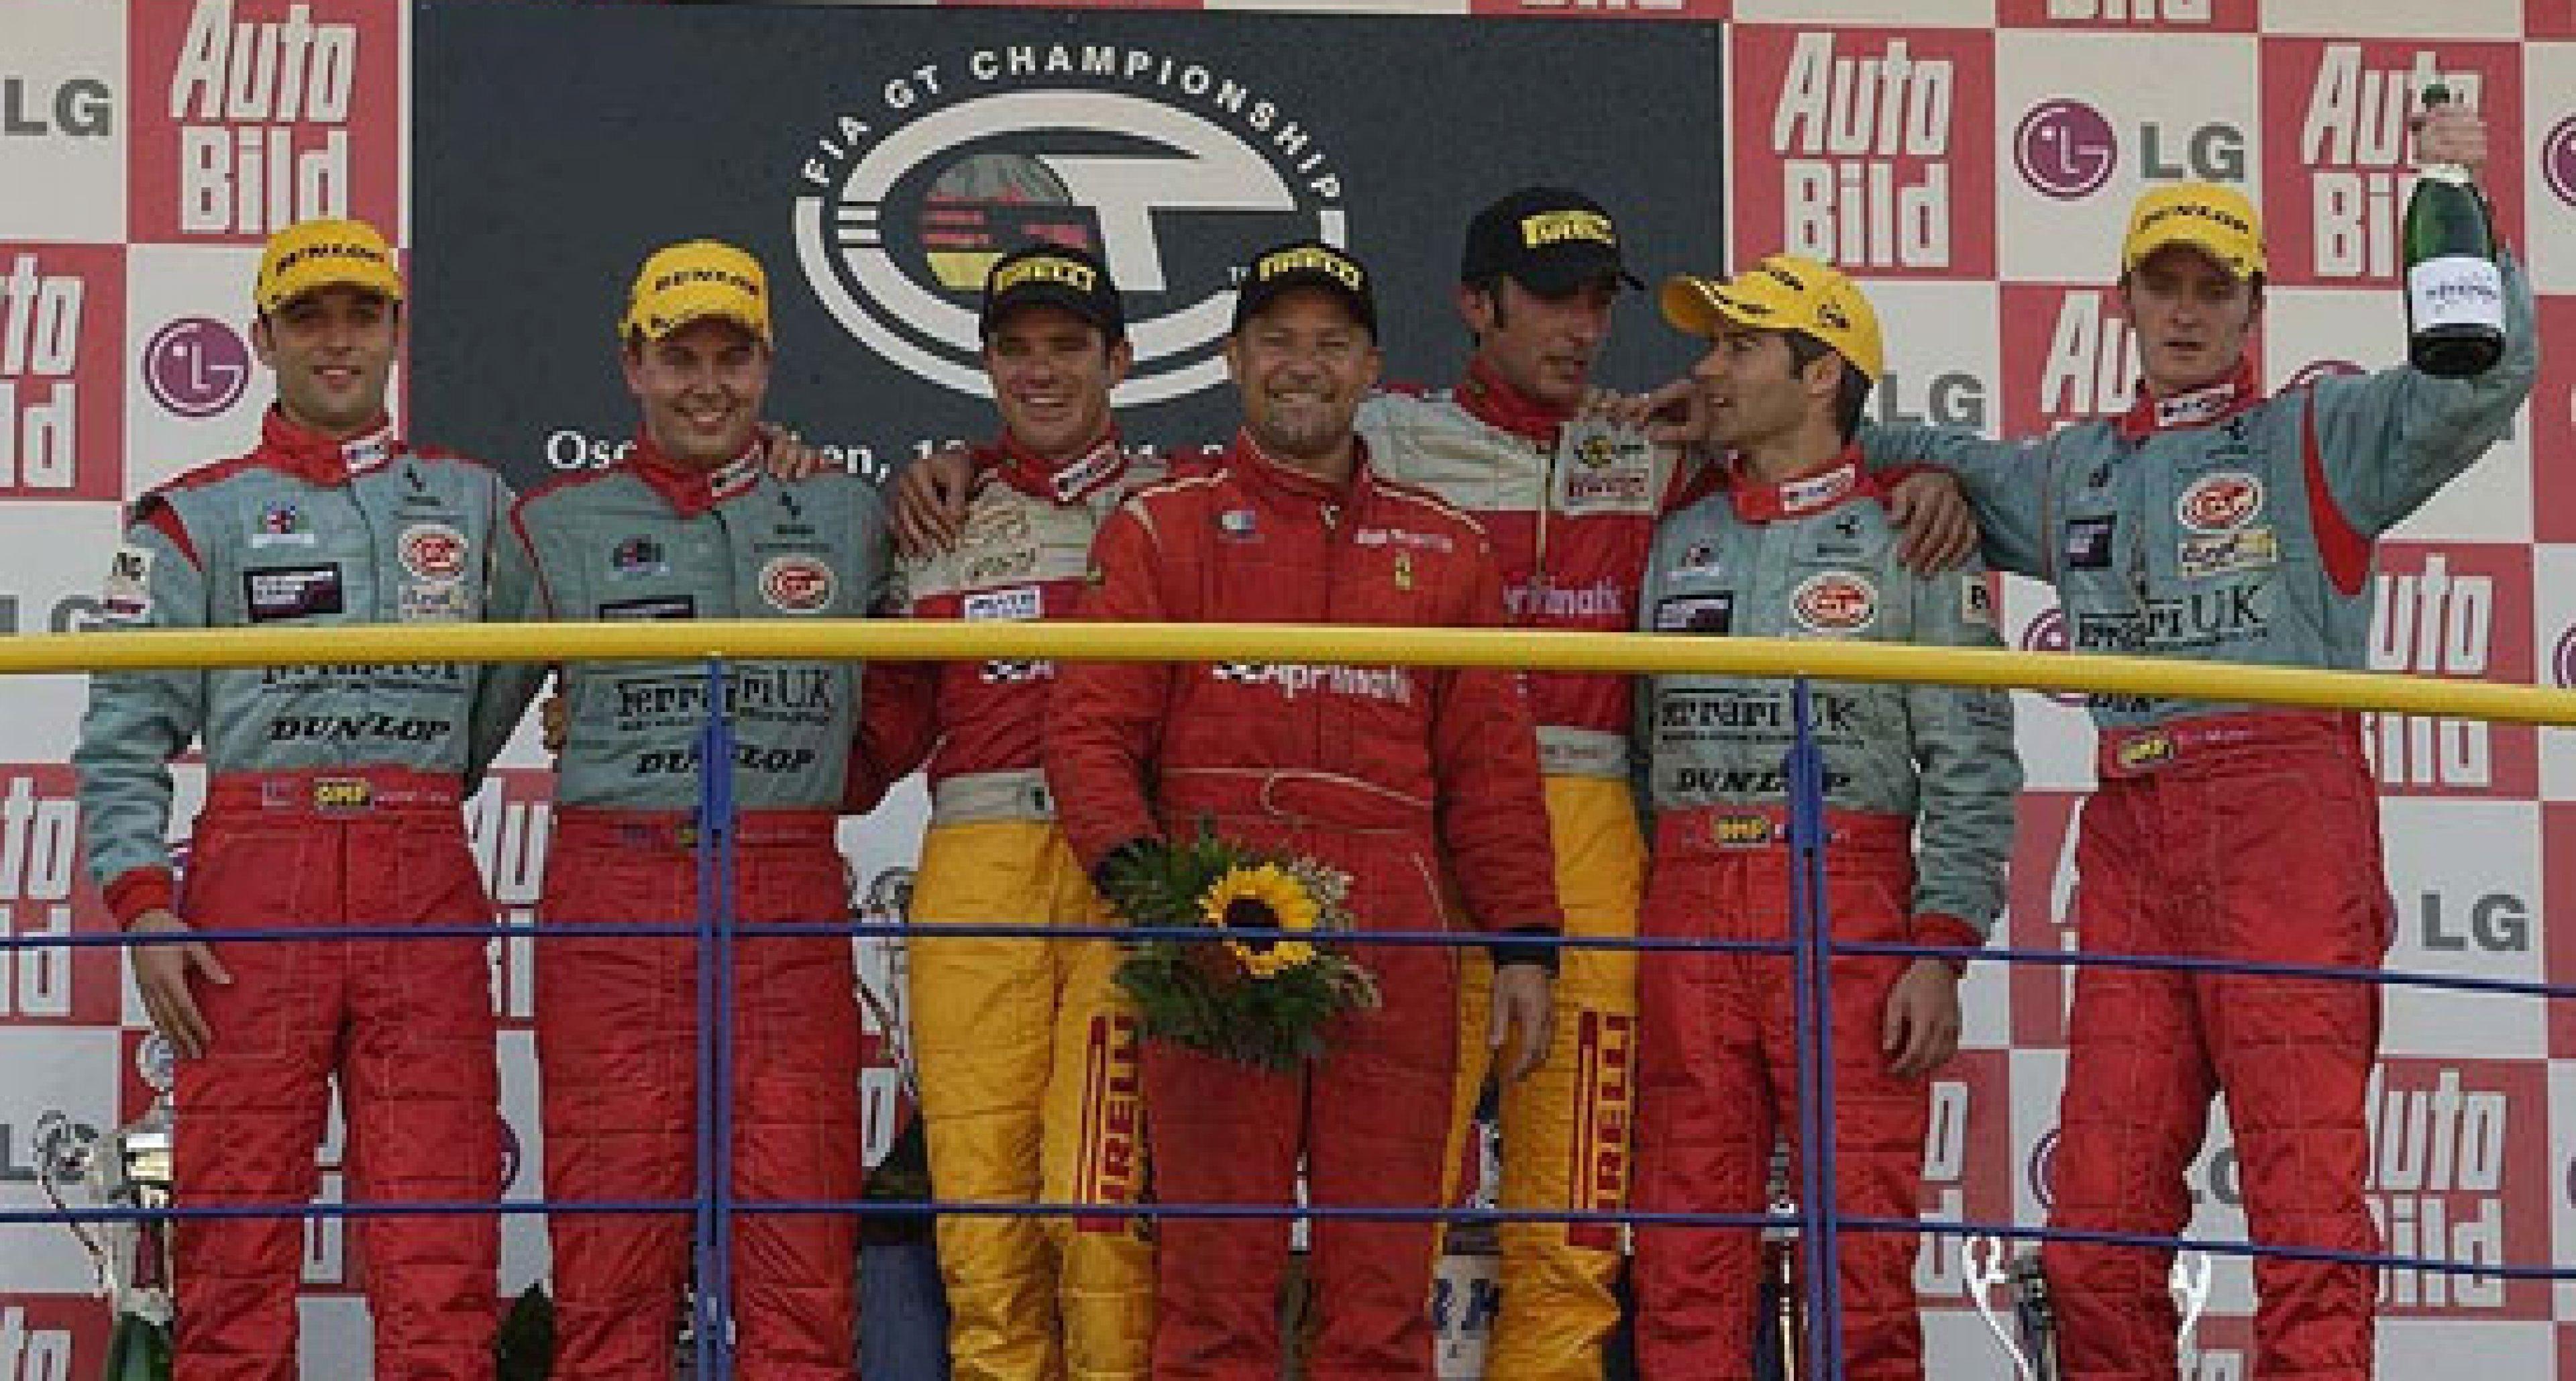 Team Maranello Concessionaires - Oschersleben, Germany 2nd & 3rd in class